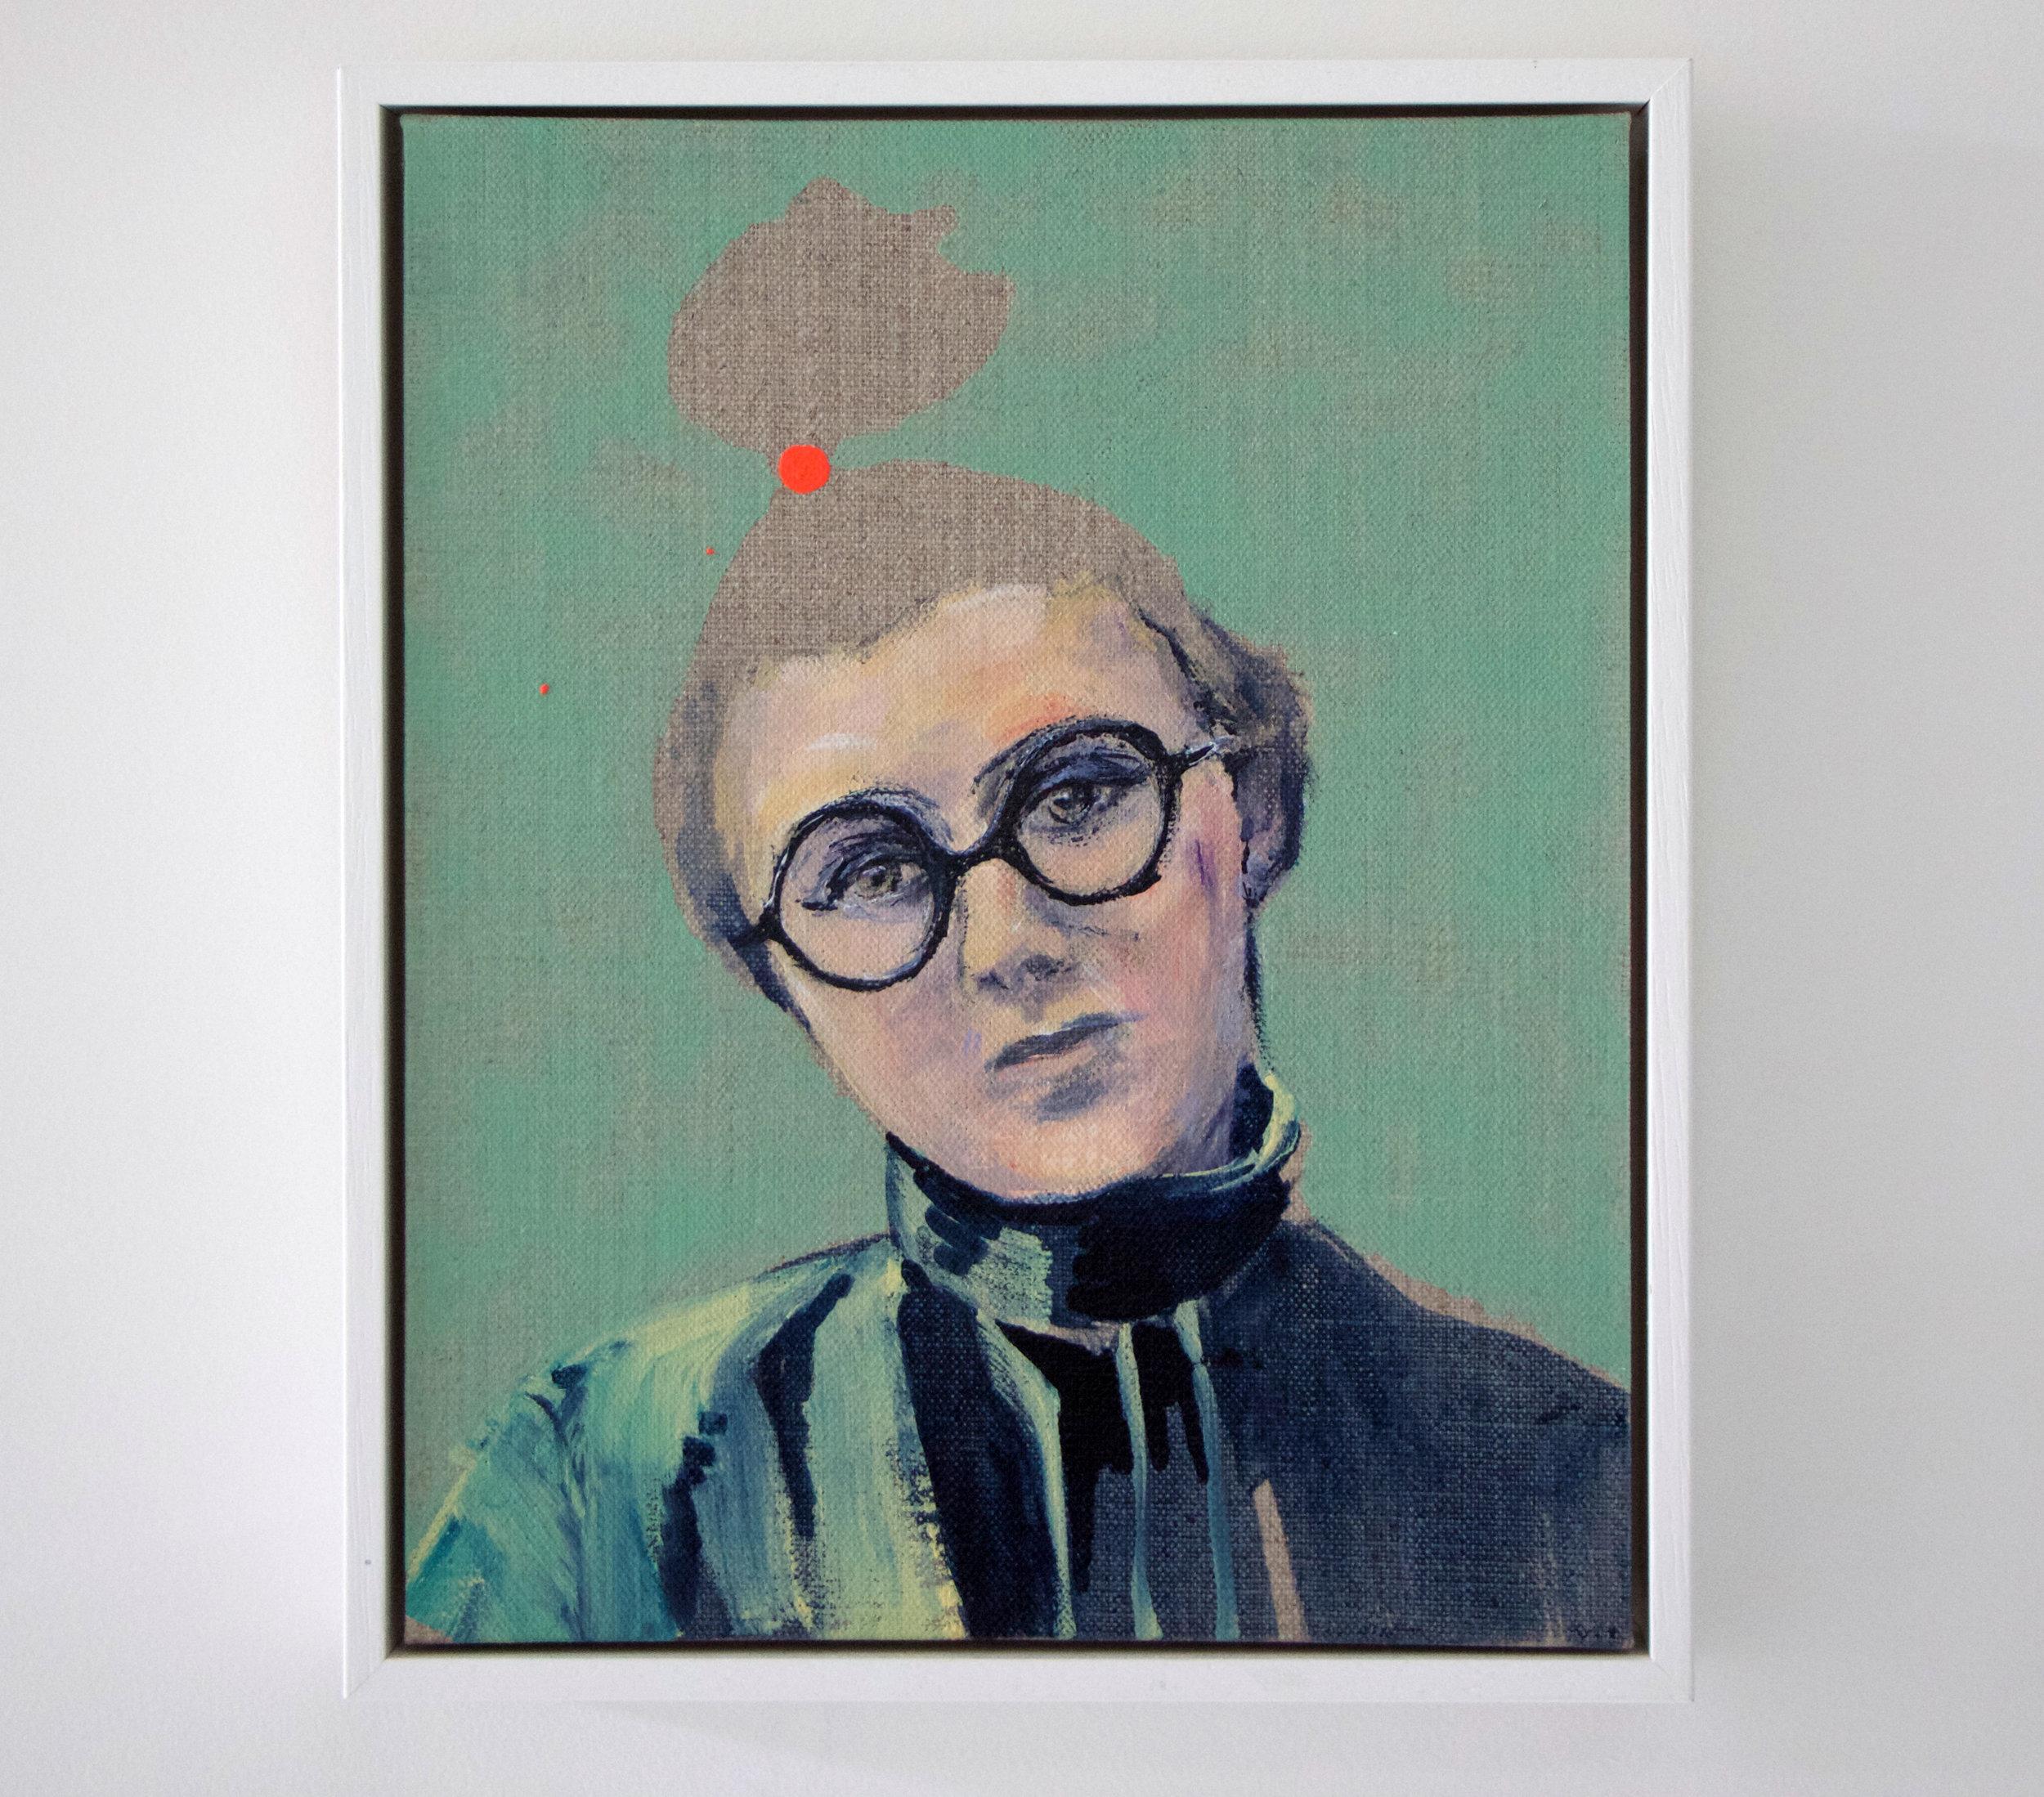 Kathryn Cowen,  Dahlia , 2015, acrylic and ink on linen, 25.4 x 20.3cm